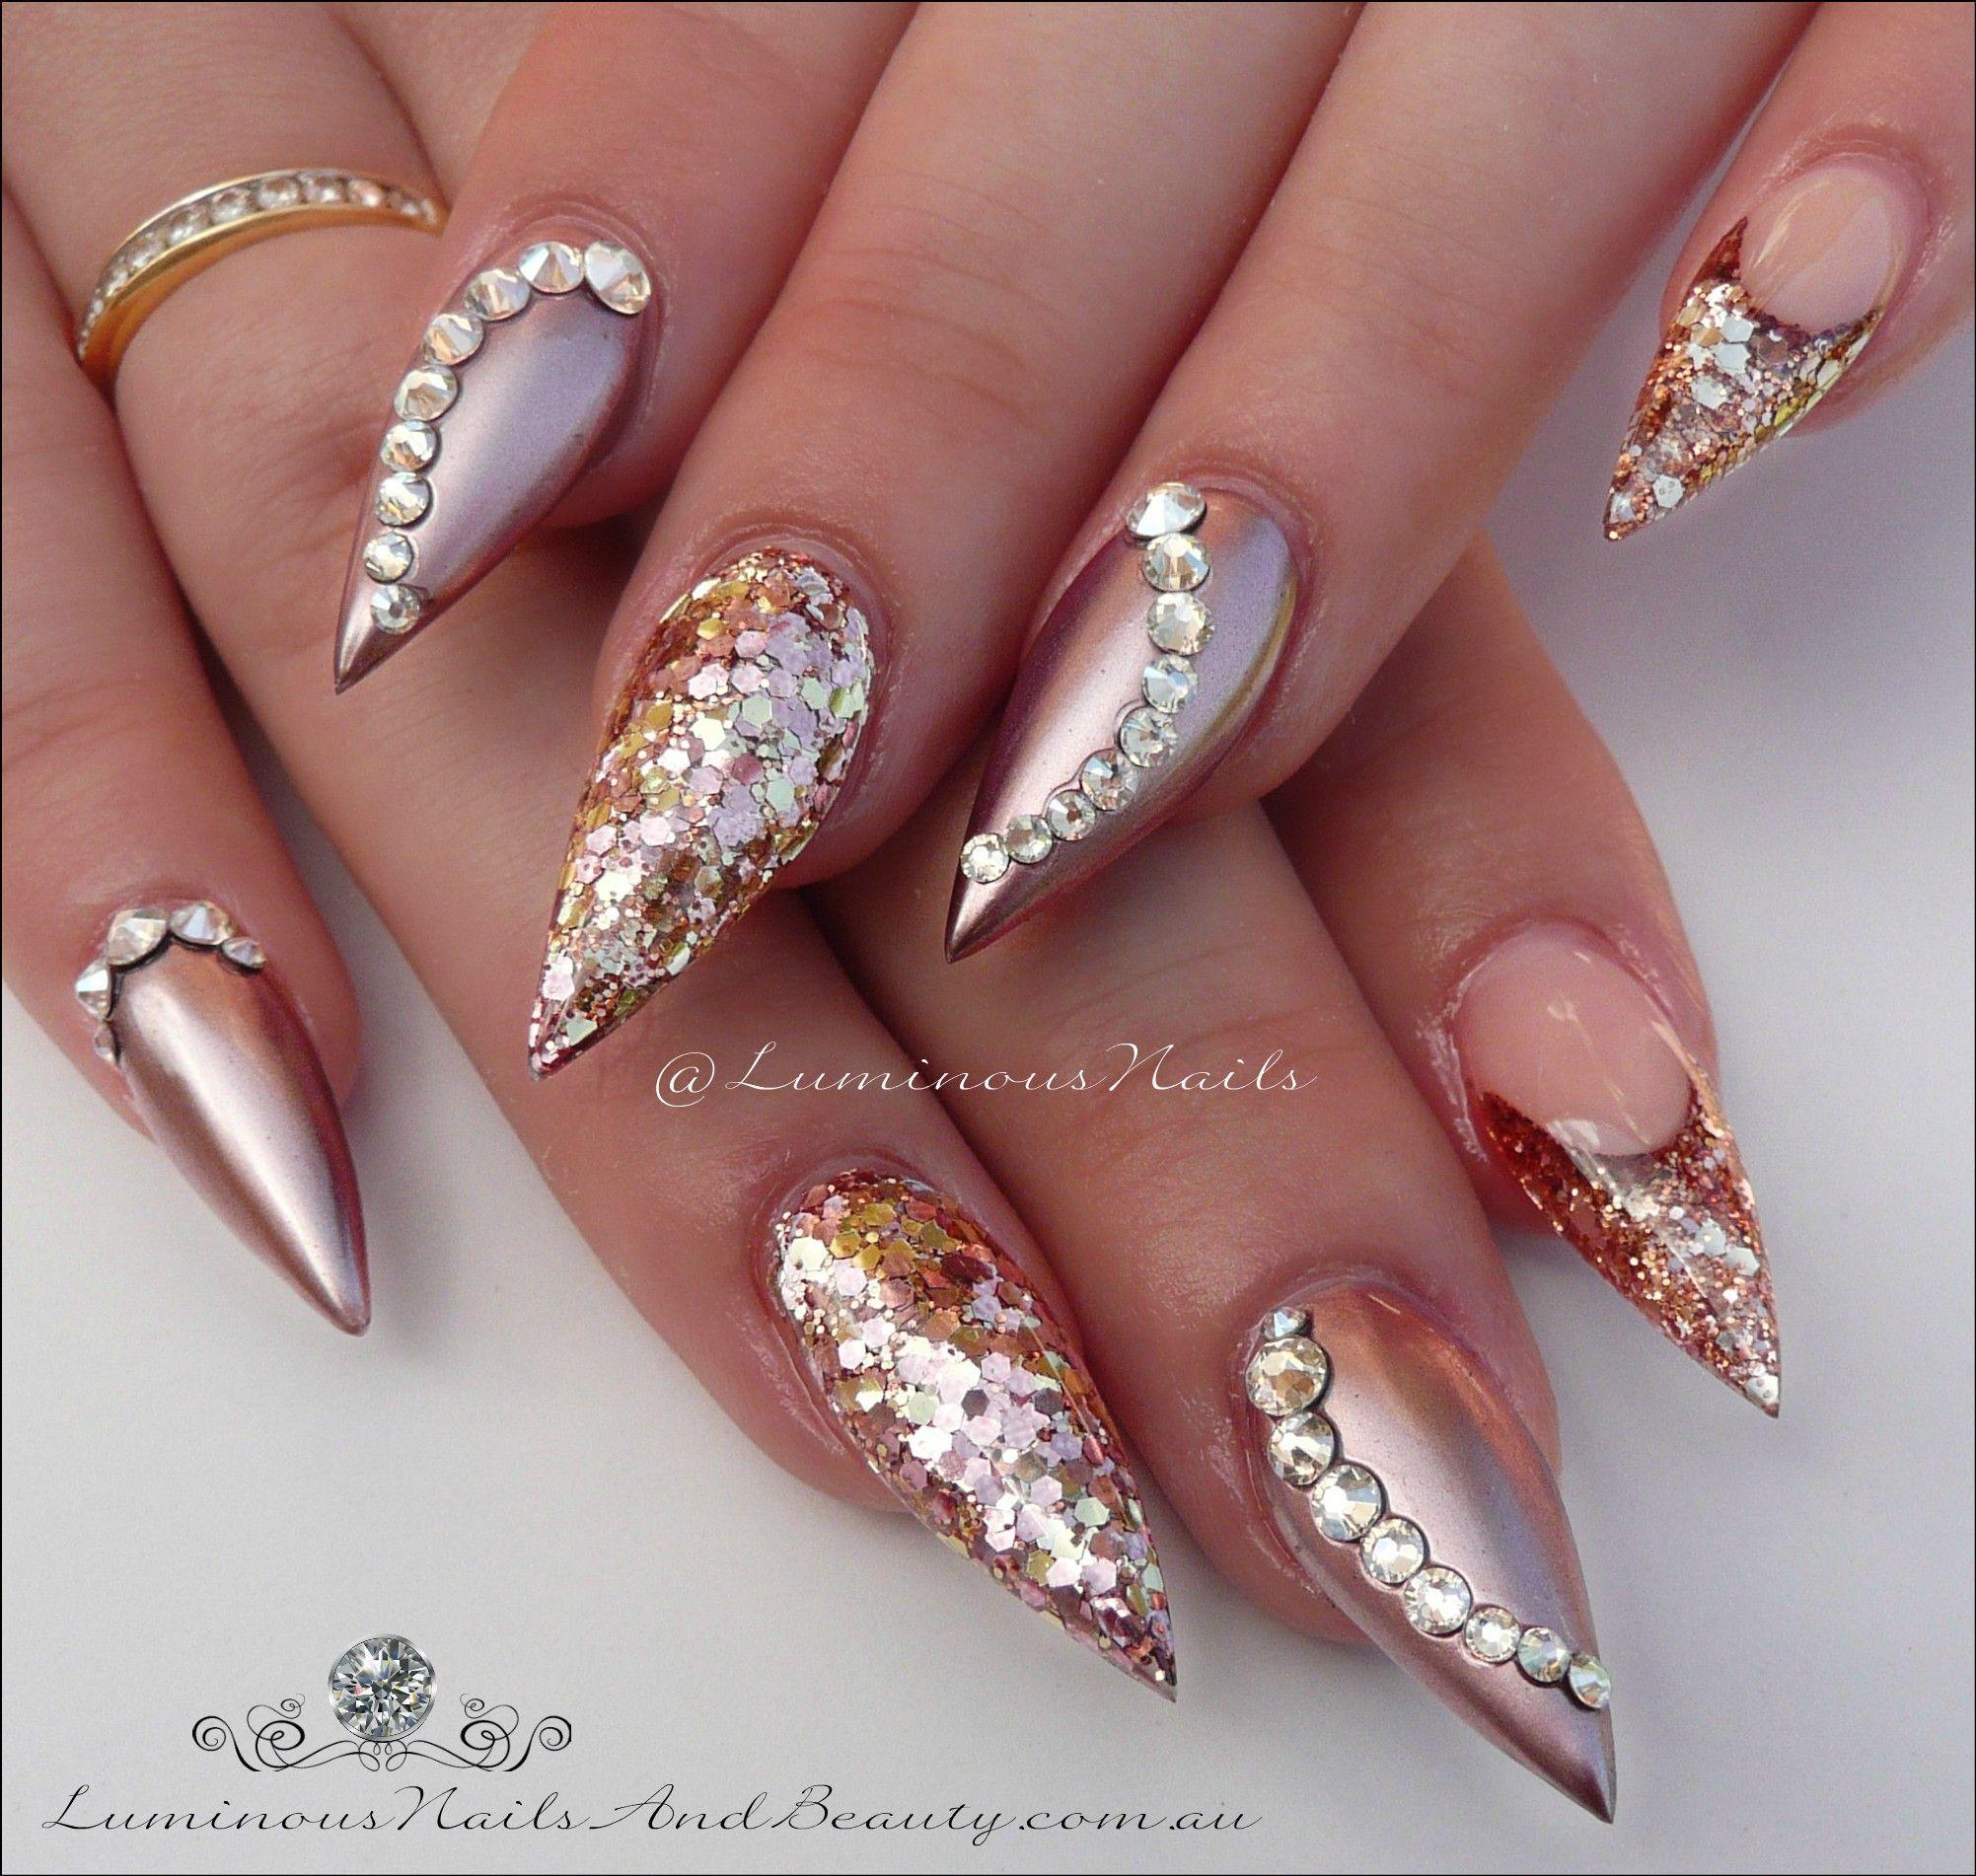 Luminous Nails and Beauty - Gold Coast - Queensland - Acrylic Nails ...